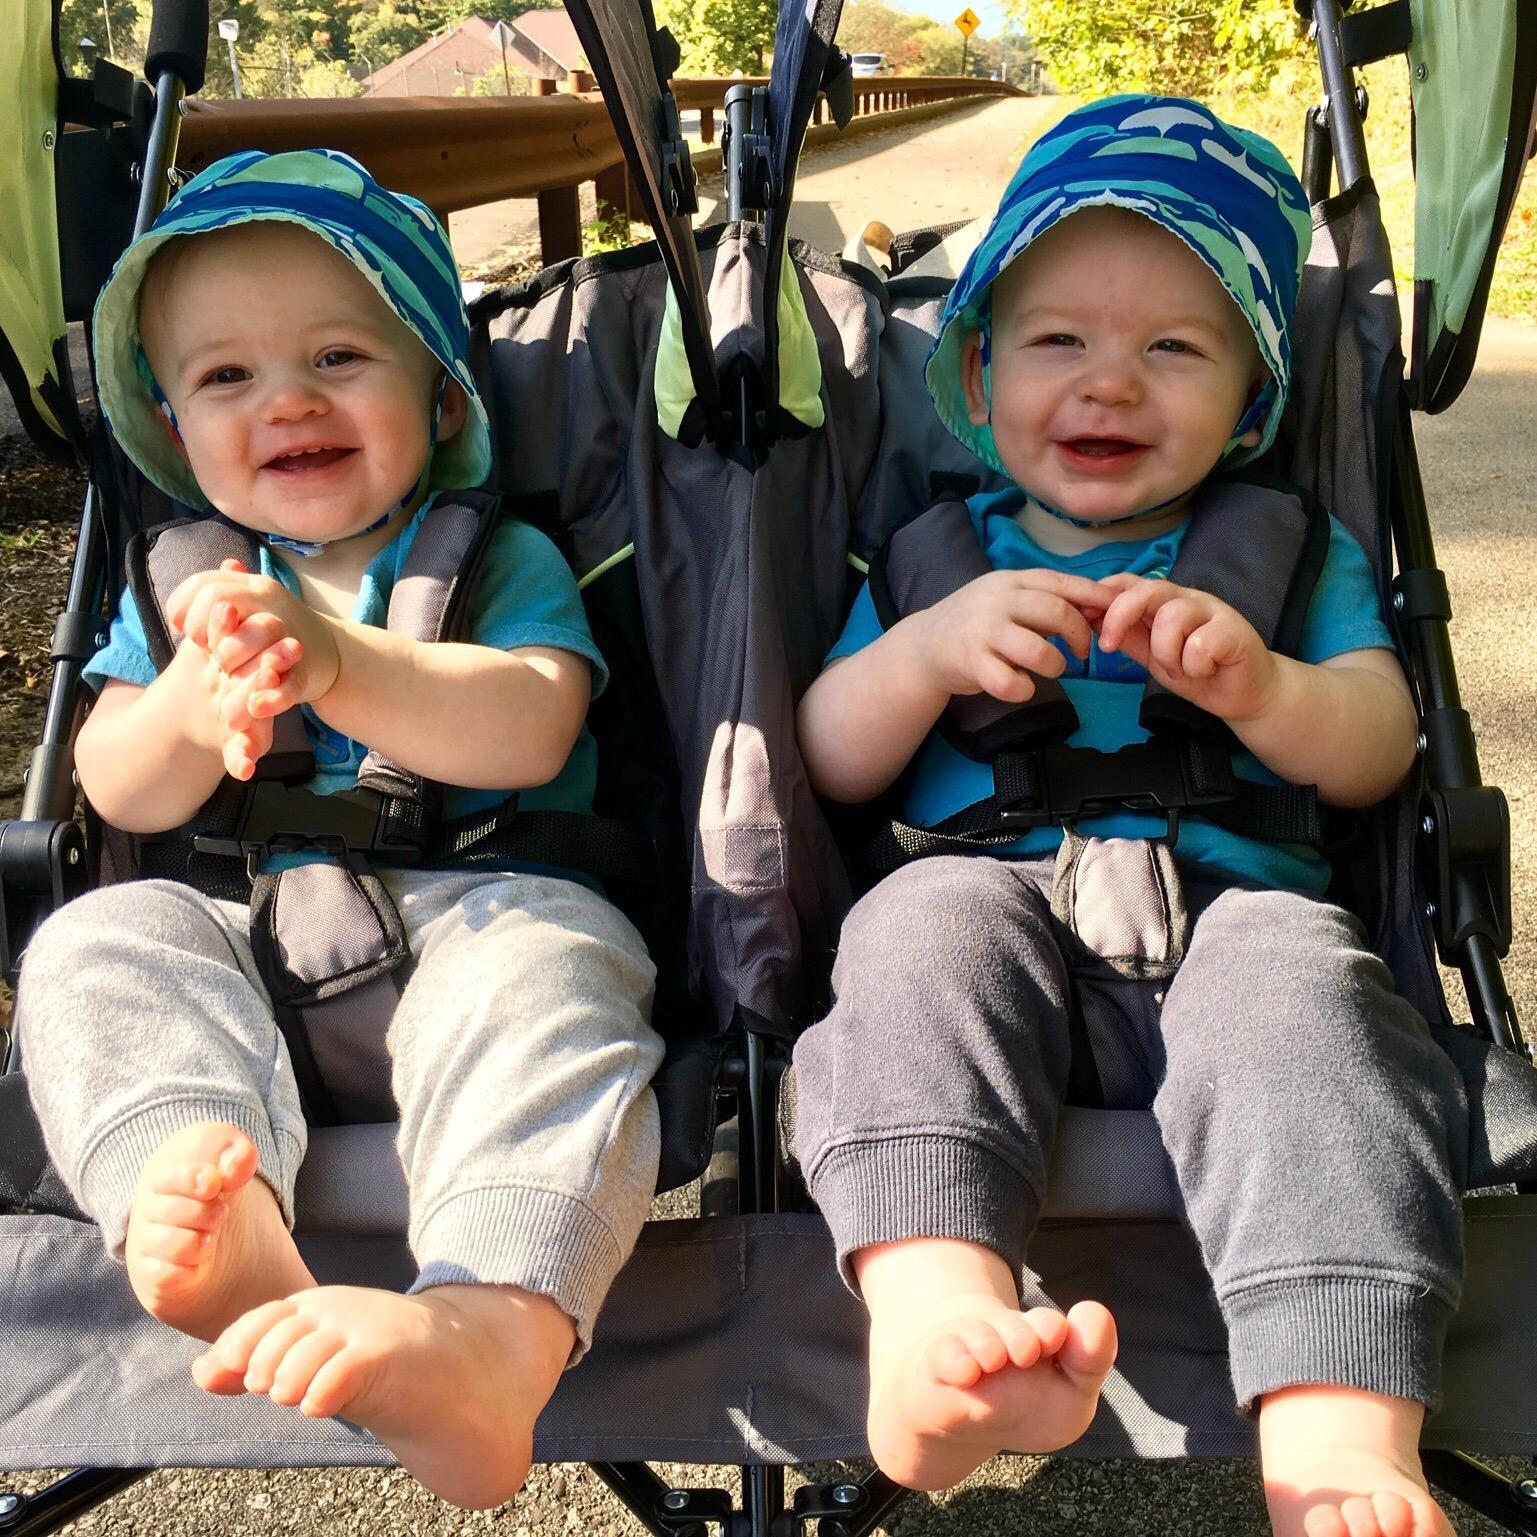 Julian & Joshua, 11 months old, enjoying a walk